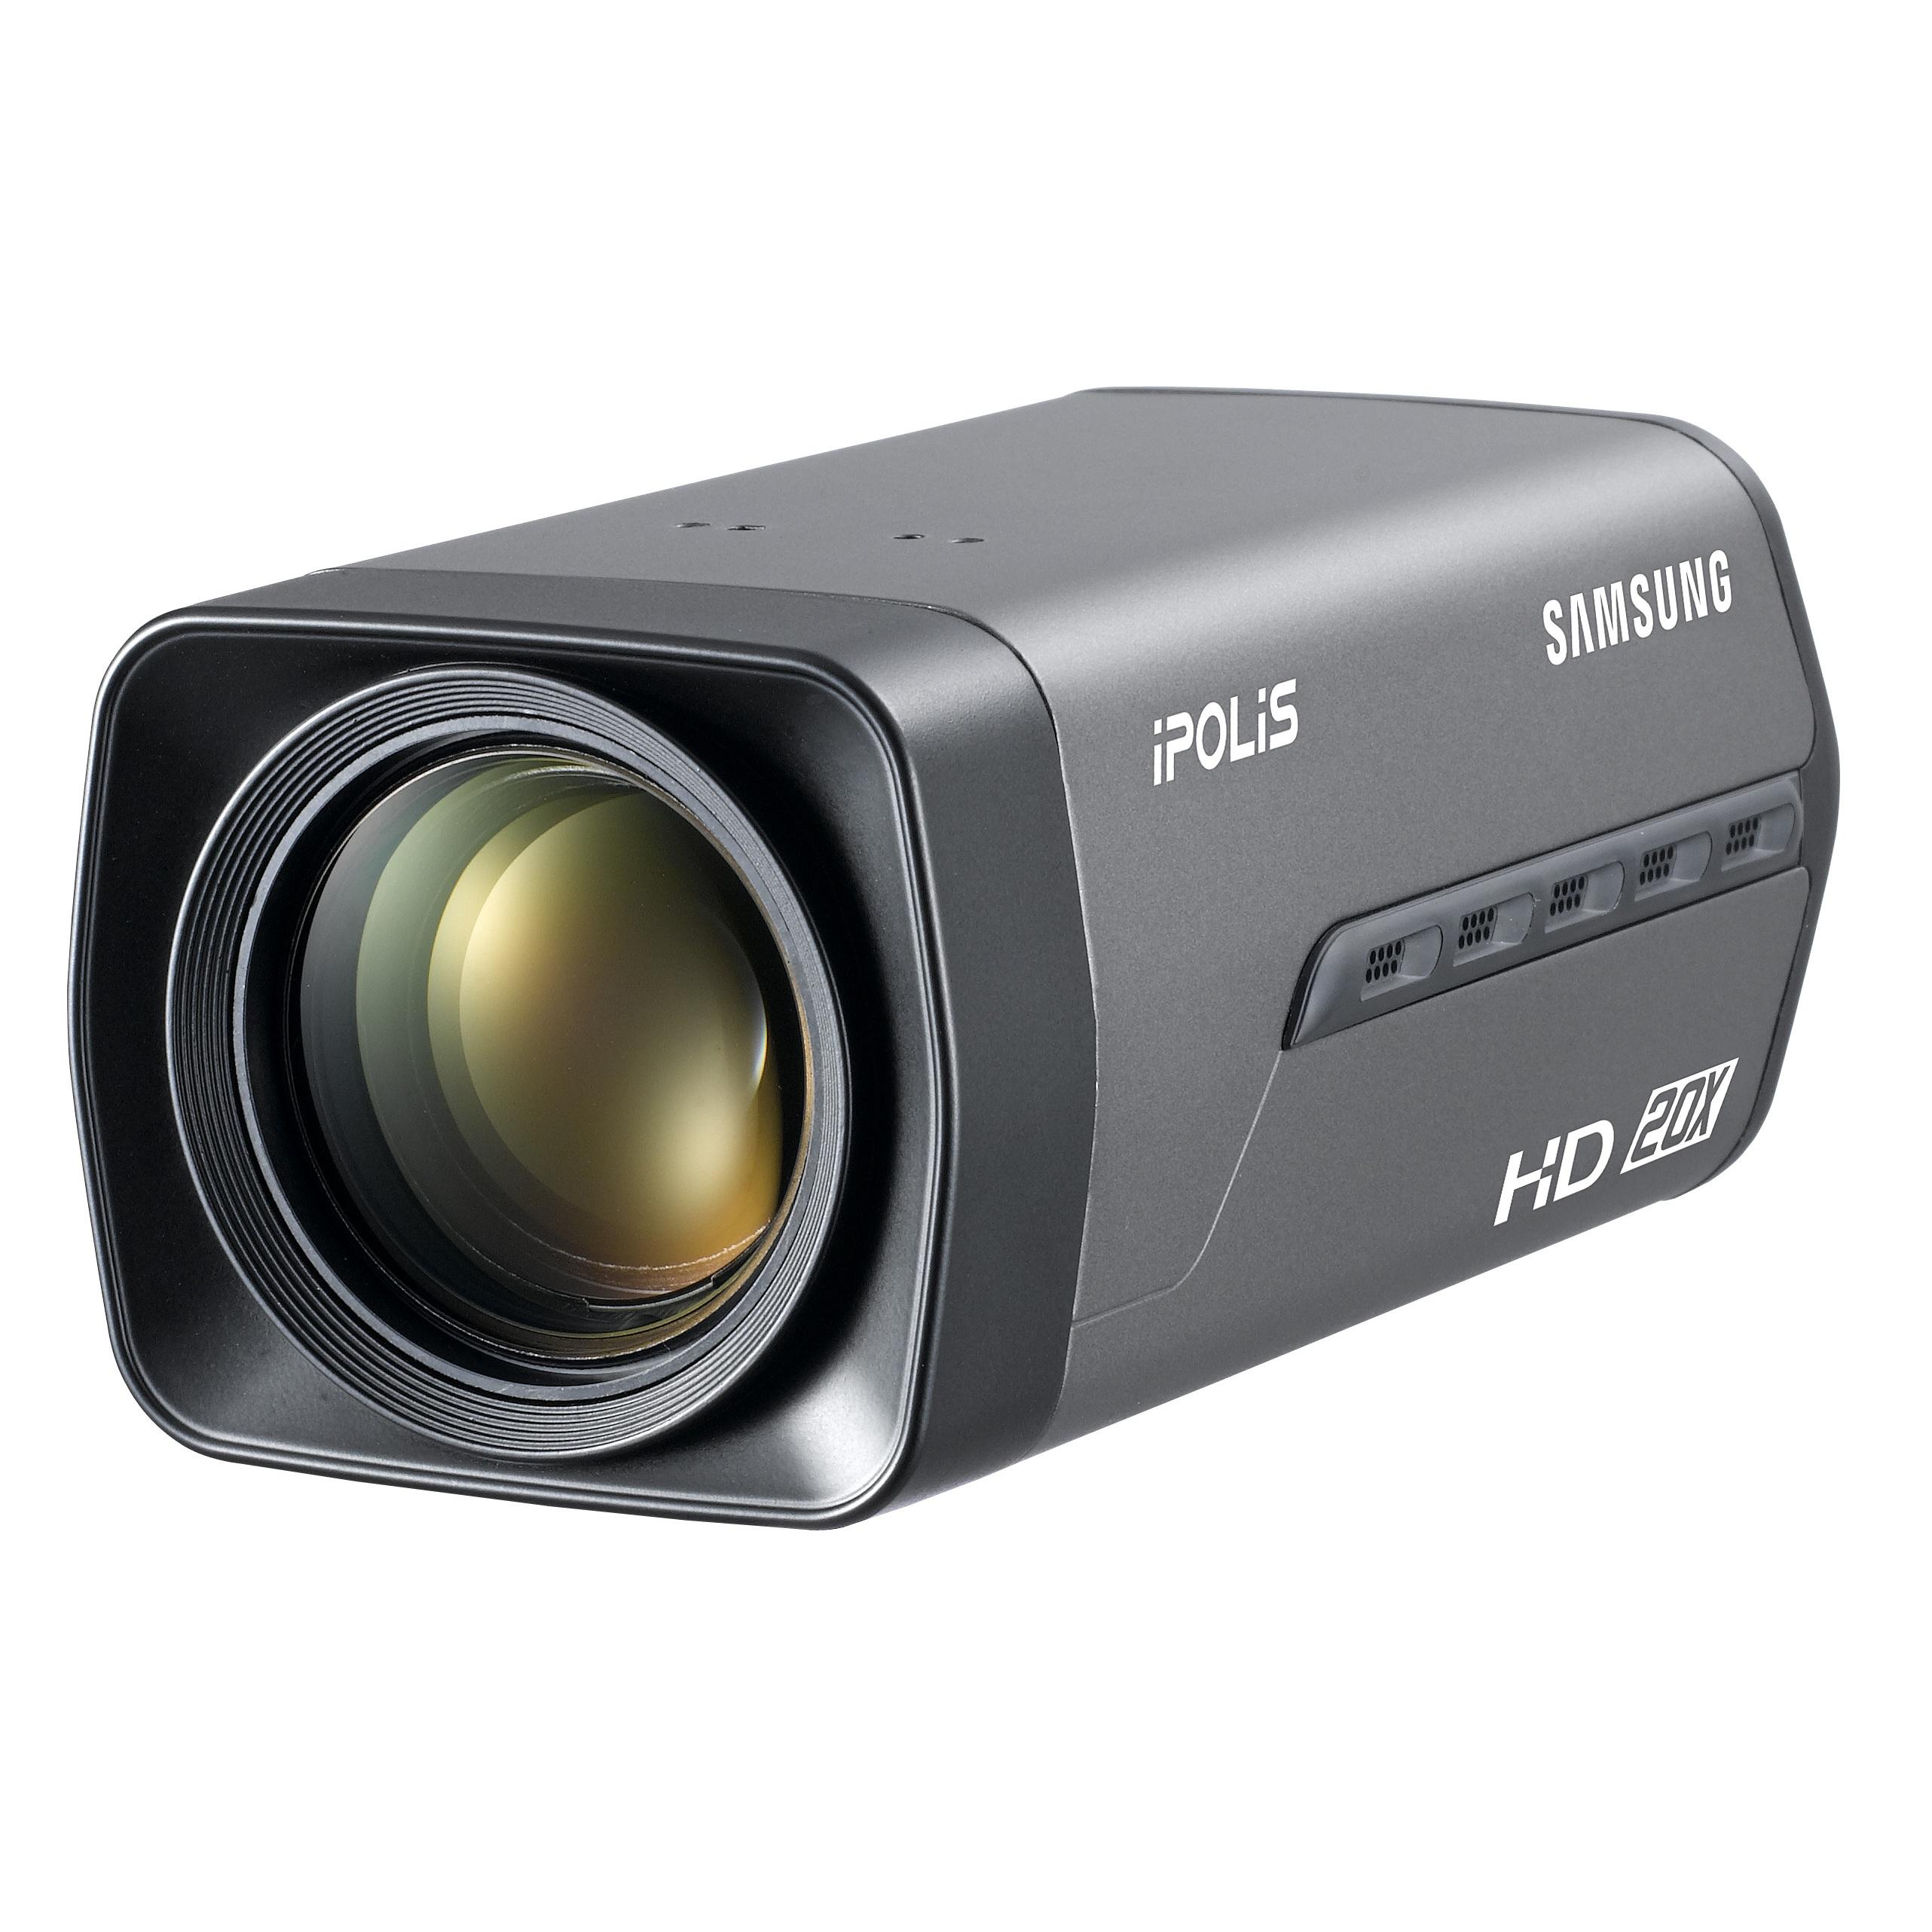 Samsung Ipolis Snz 5200 1 3mp 20x Zoom Network Camera